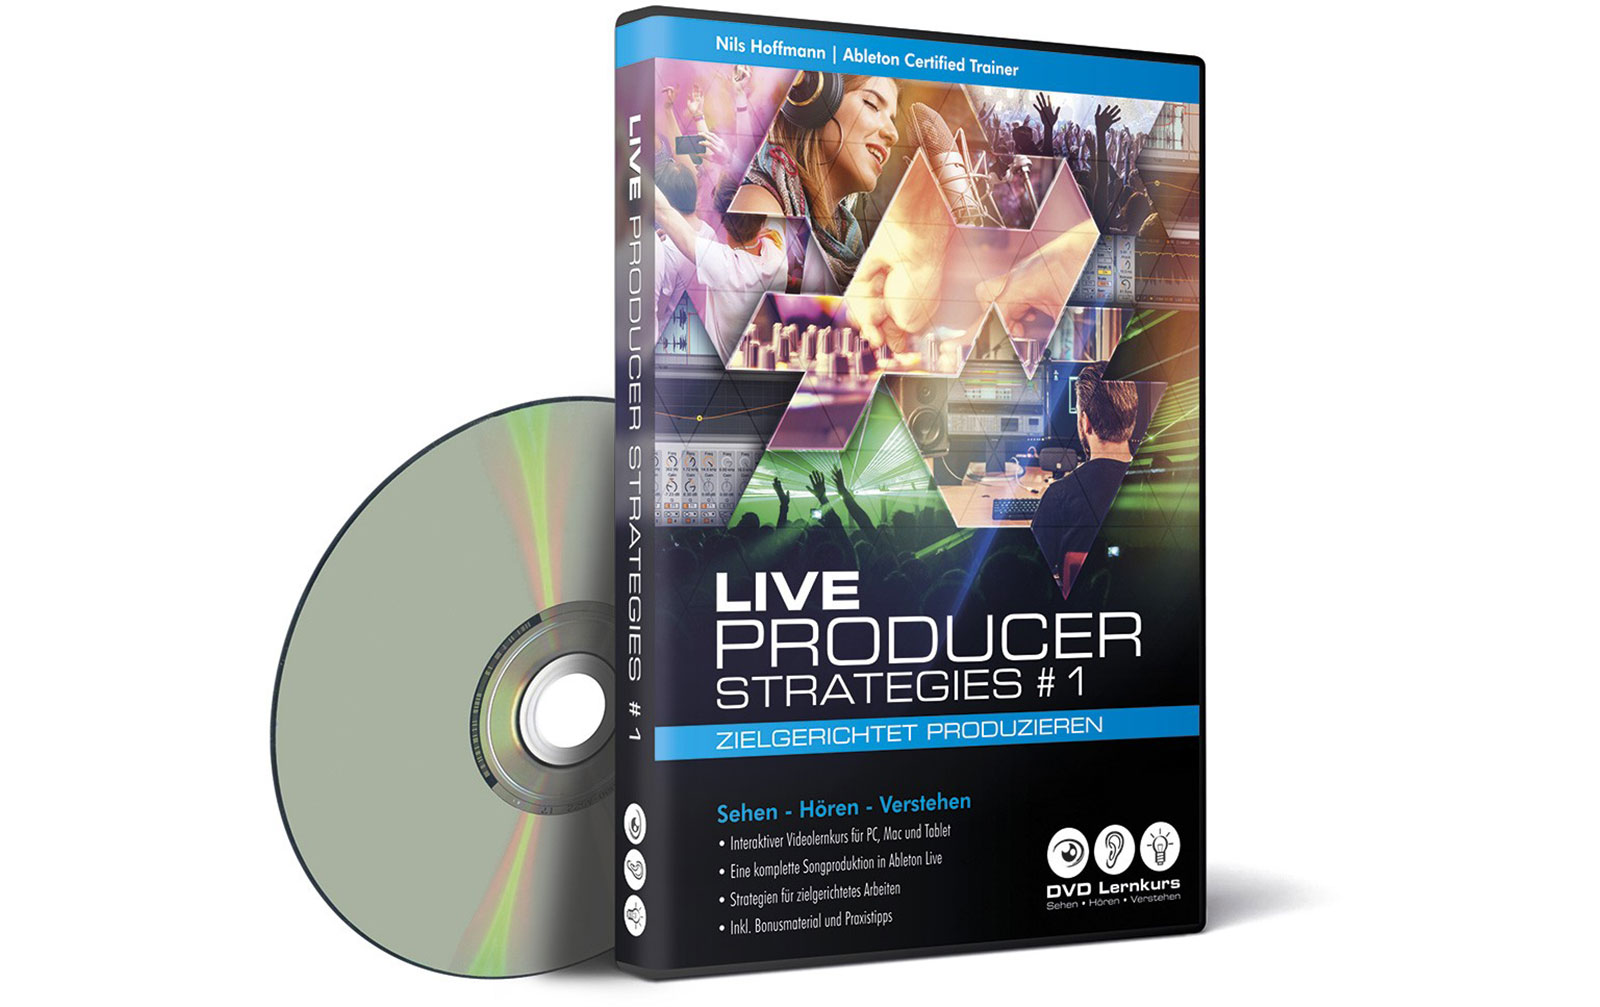 dvd-lernkurs-ableton-live-producer-strategies-1